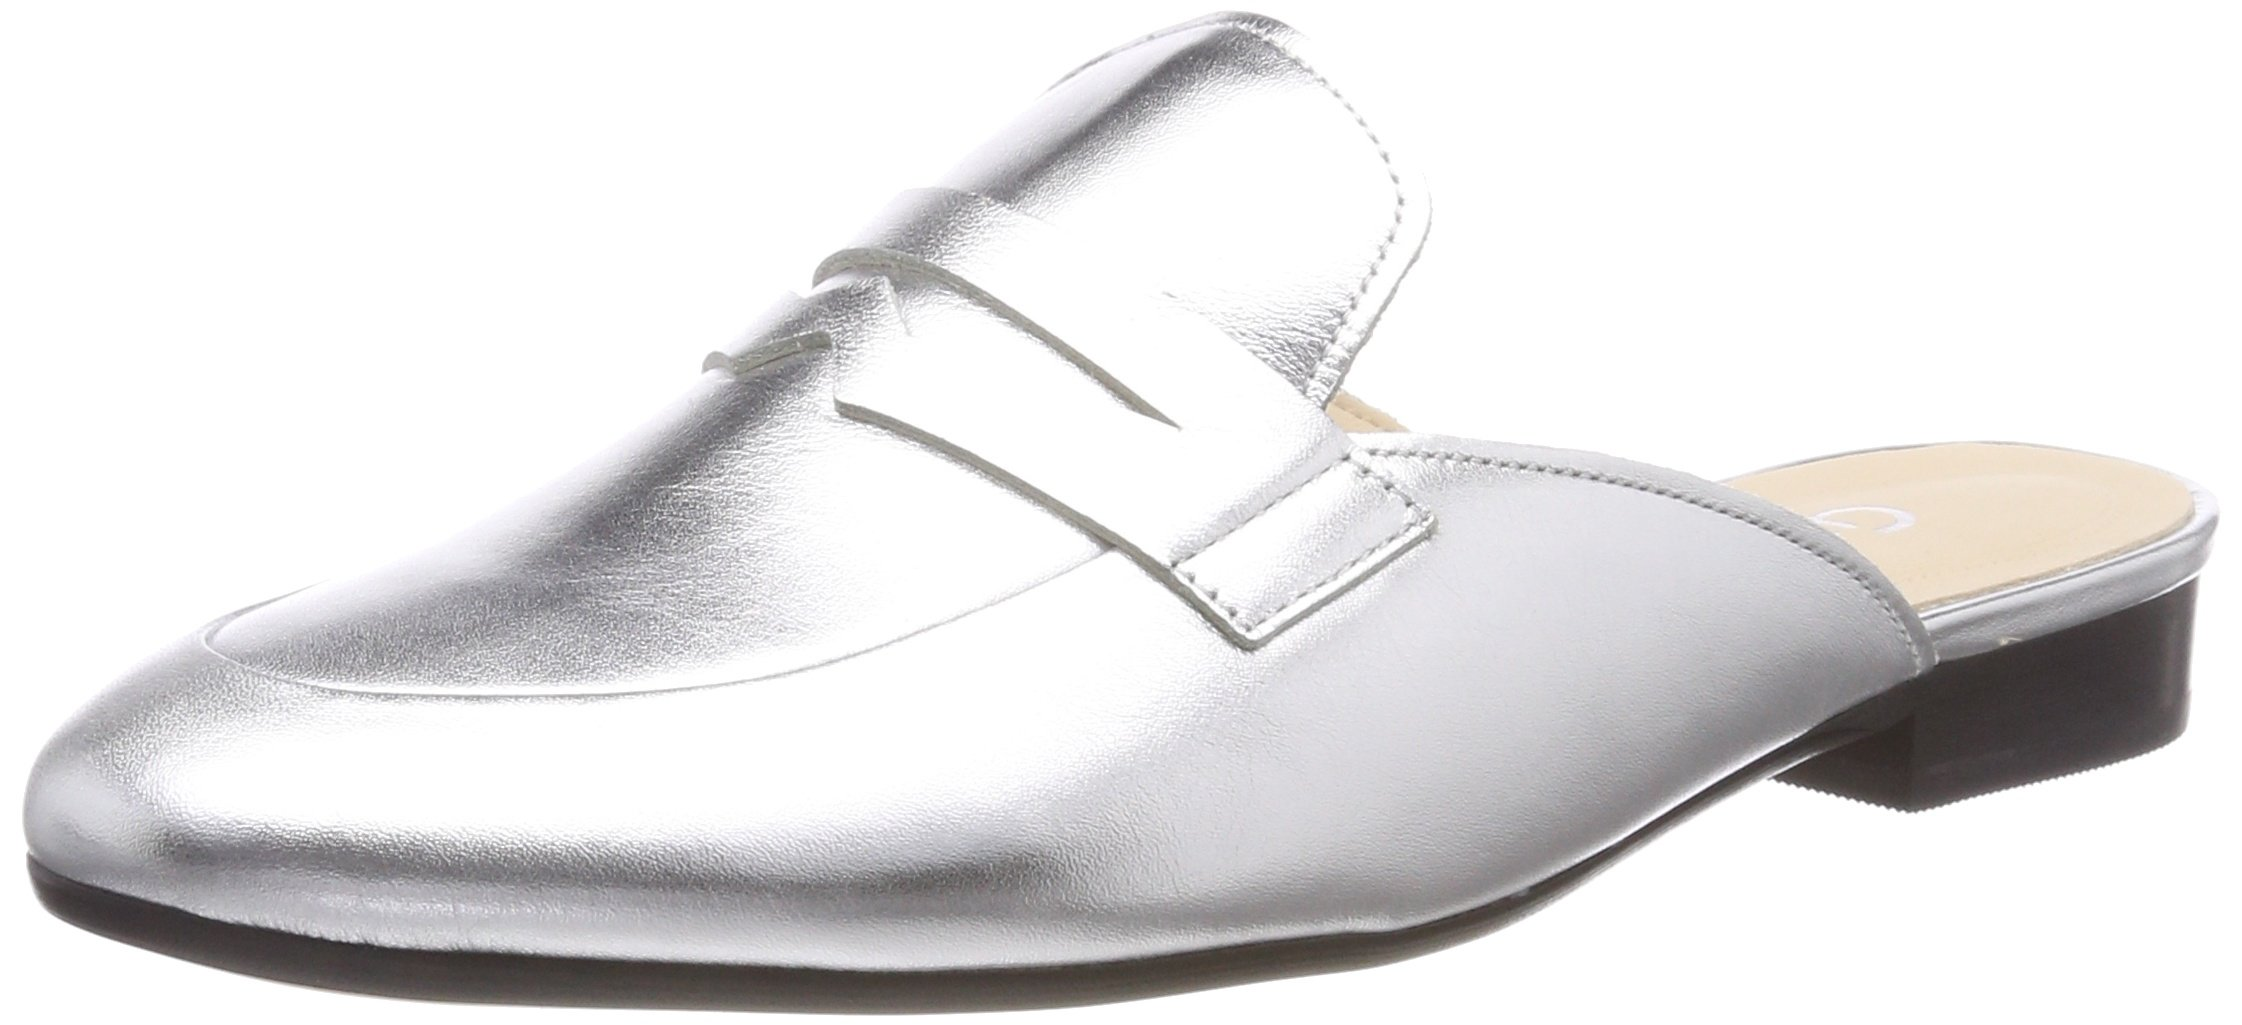 Shoes Gabor Eu SportMules Comfort FemmeMulticoloresilber39 FKc1l3TJ